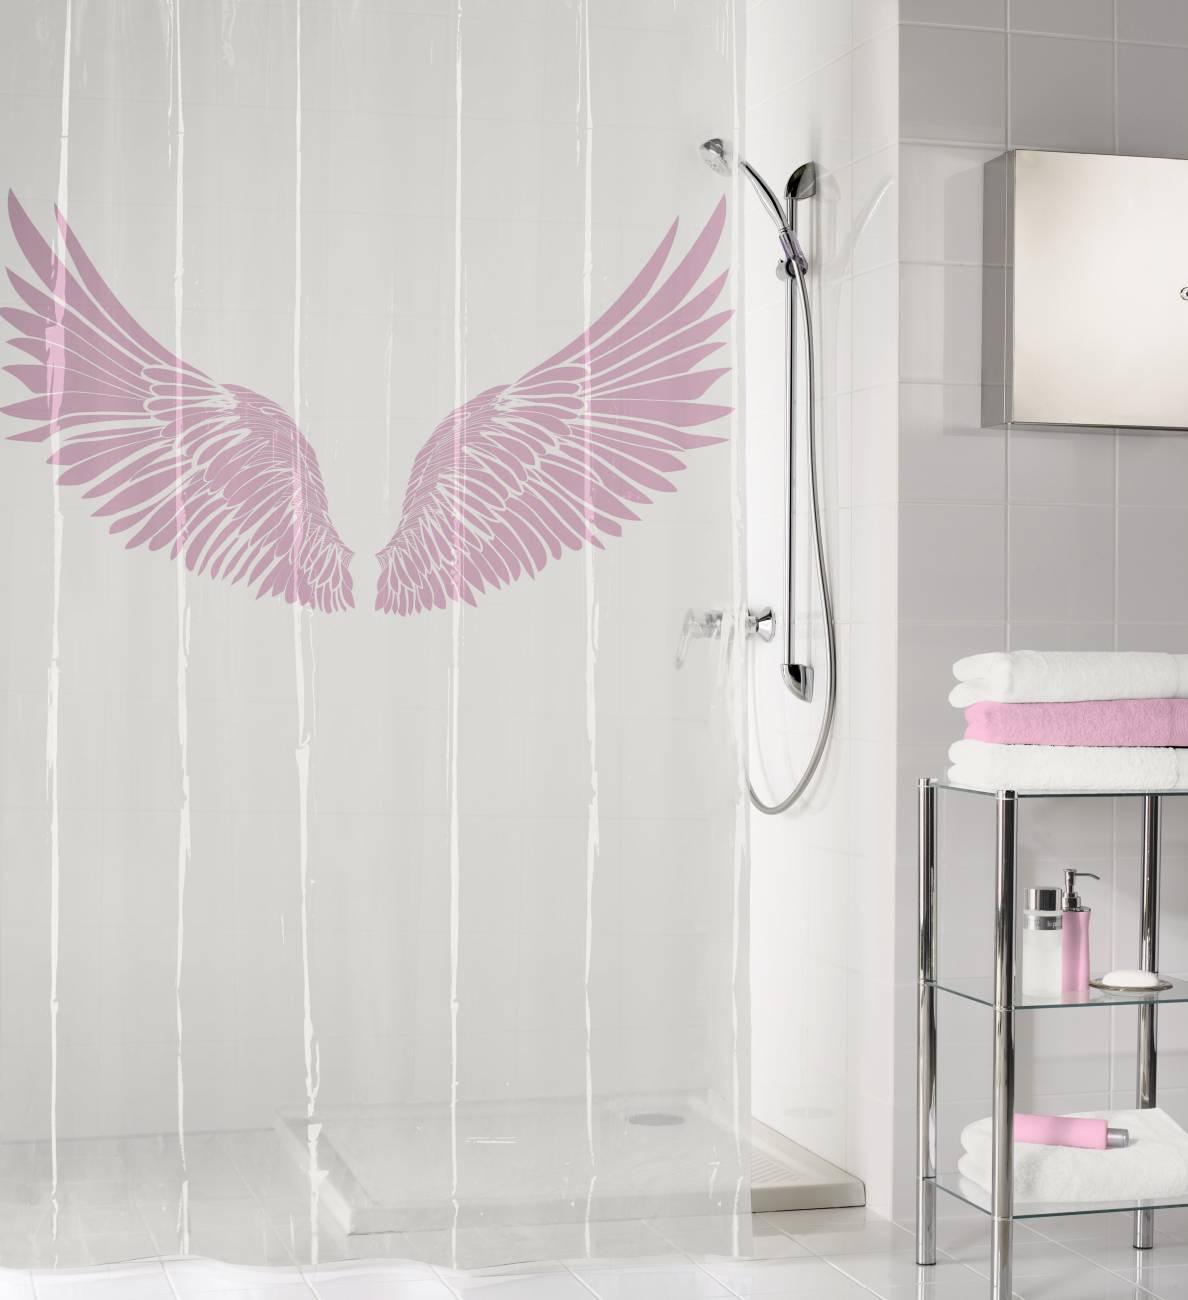 Duschvorhang Wings PEVA Flamingo 180x200 cm